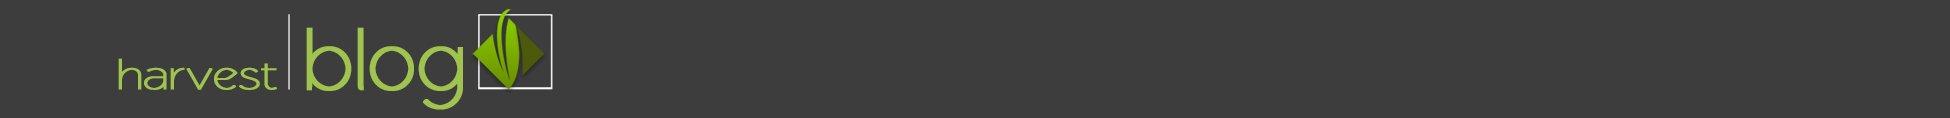 harvestblog logo homepage